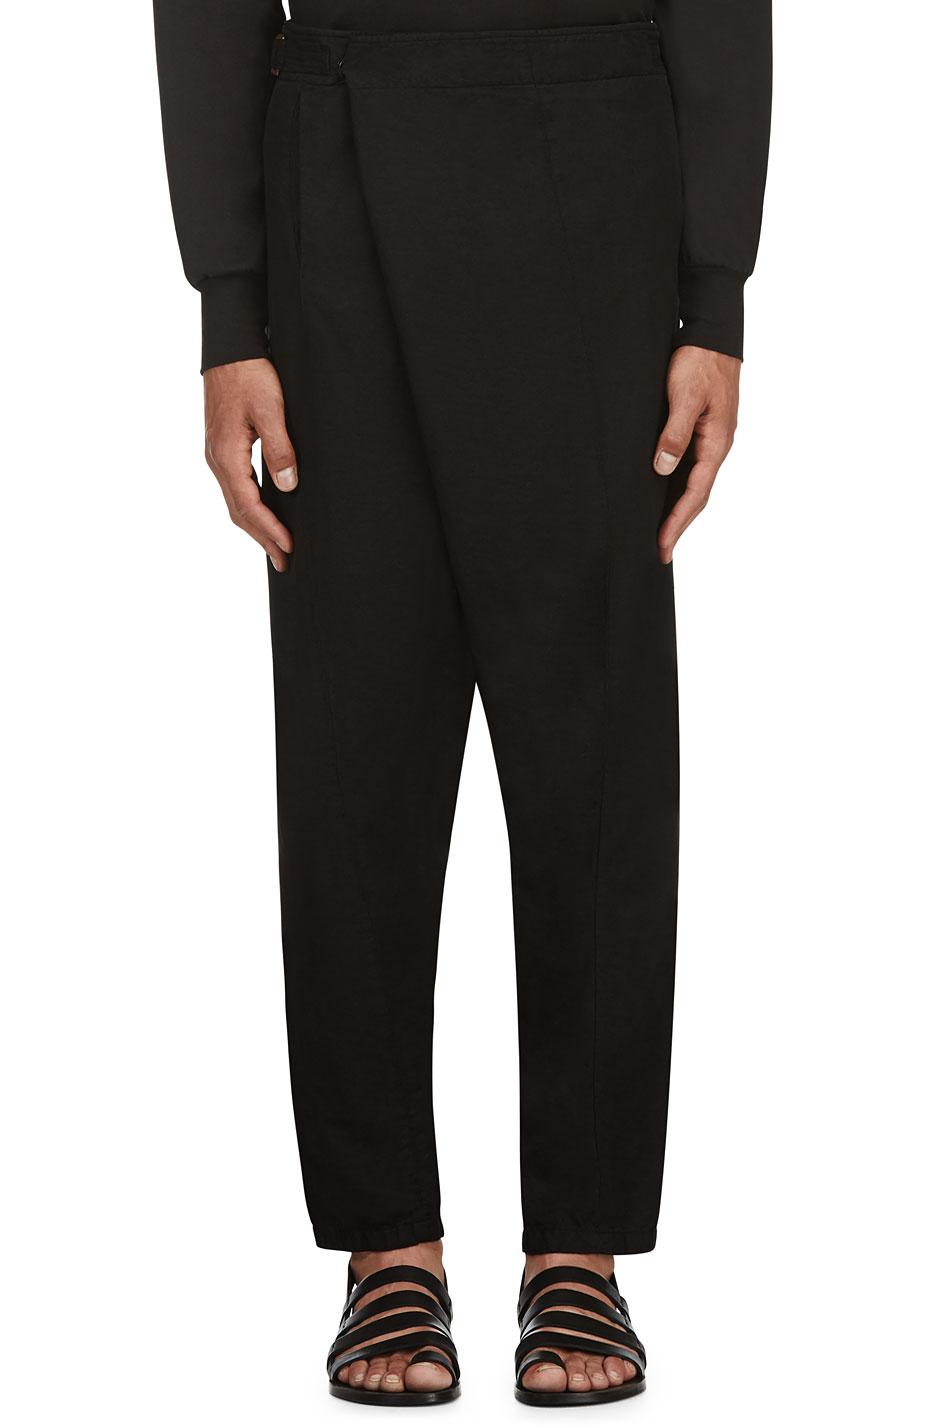 Ma julius black bamboo harem trousers